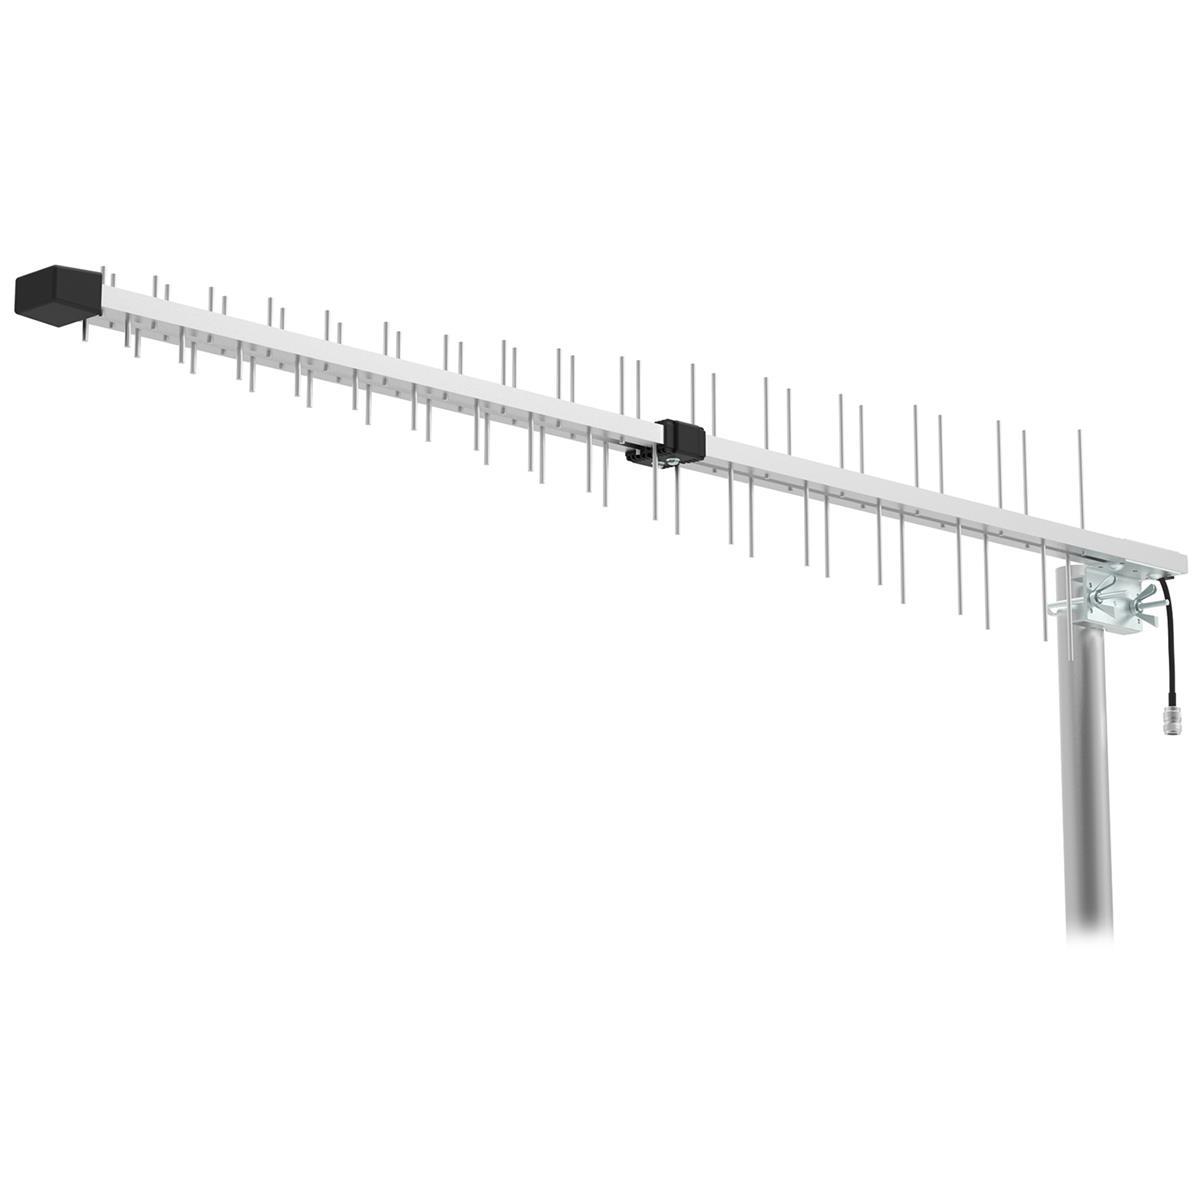 Antena Externa Para Celular Gsm Quadriband Multilaser